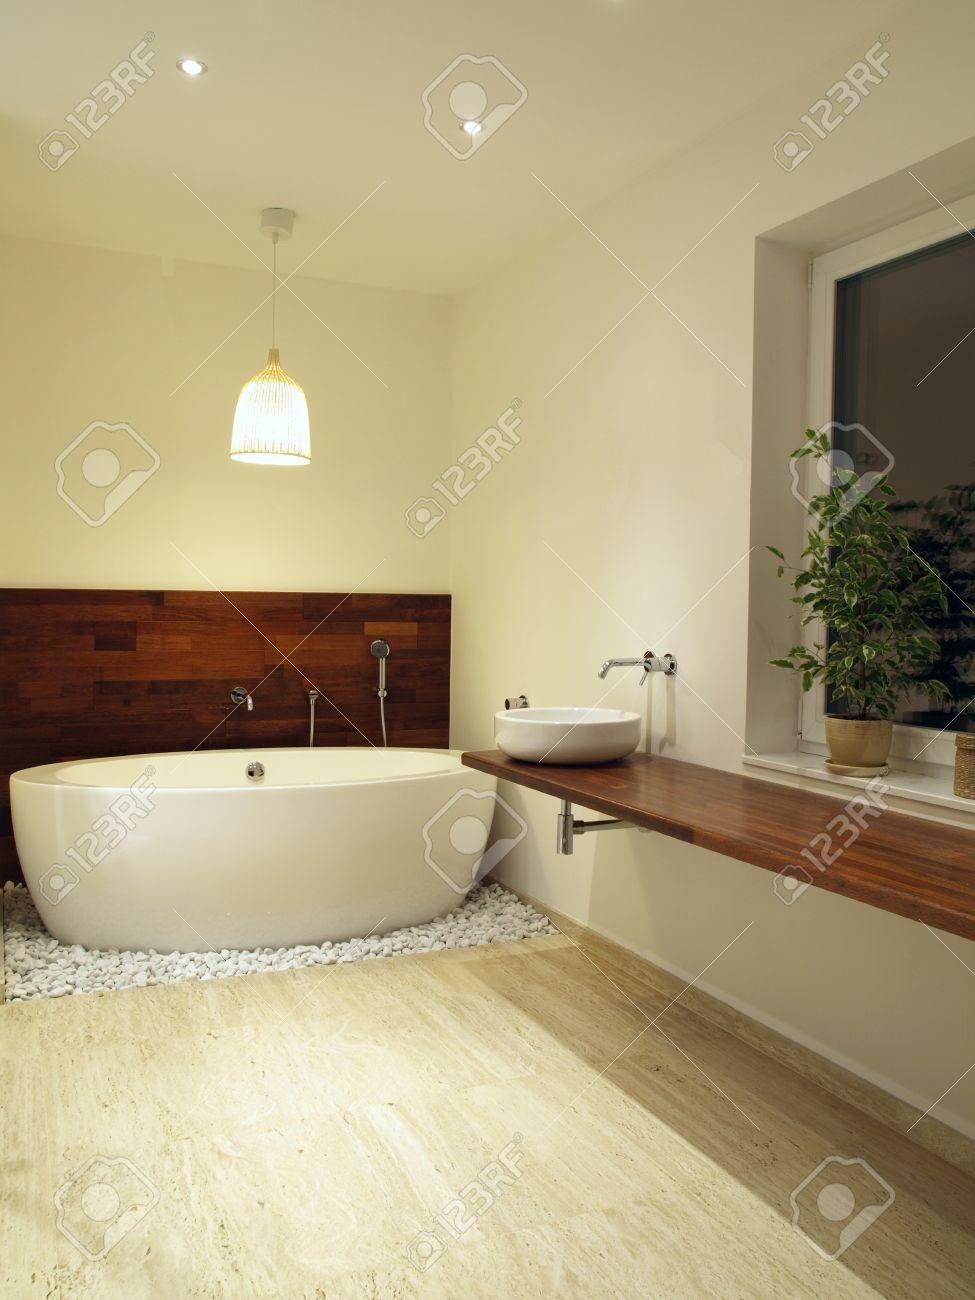 Modern en suite bathroom with travertine tiles Stock Photo - 12515208